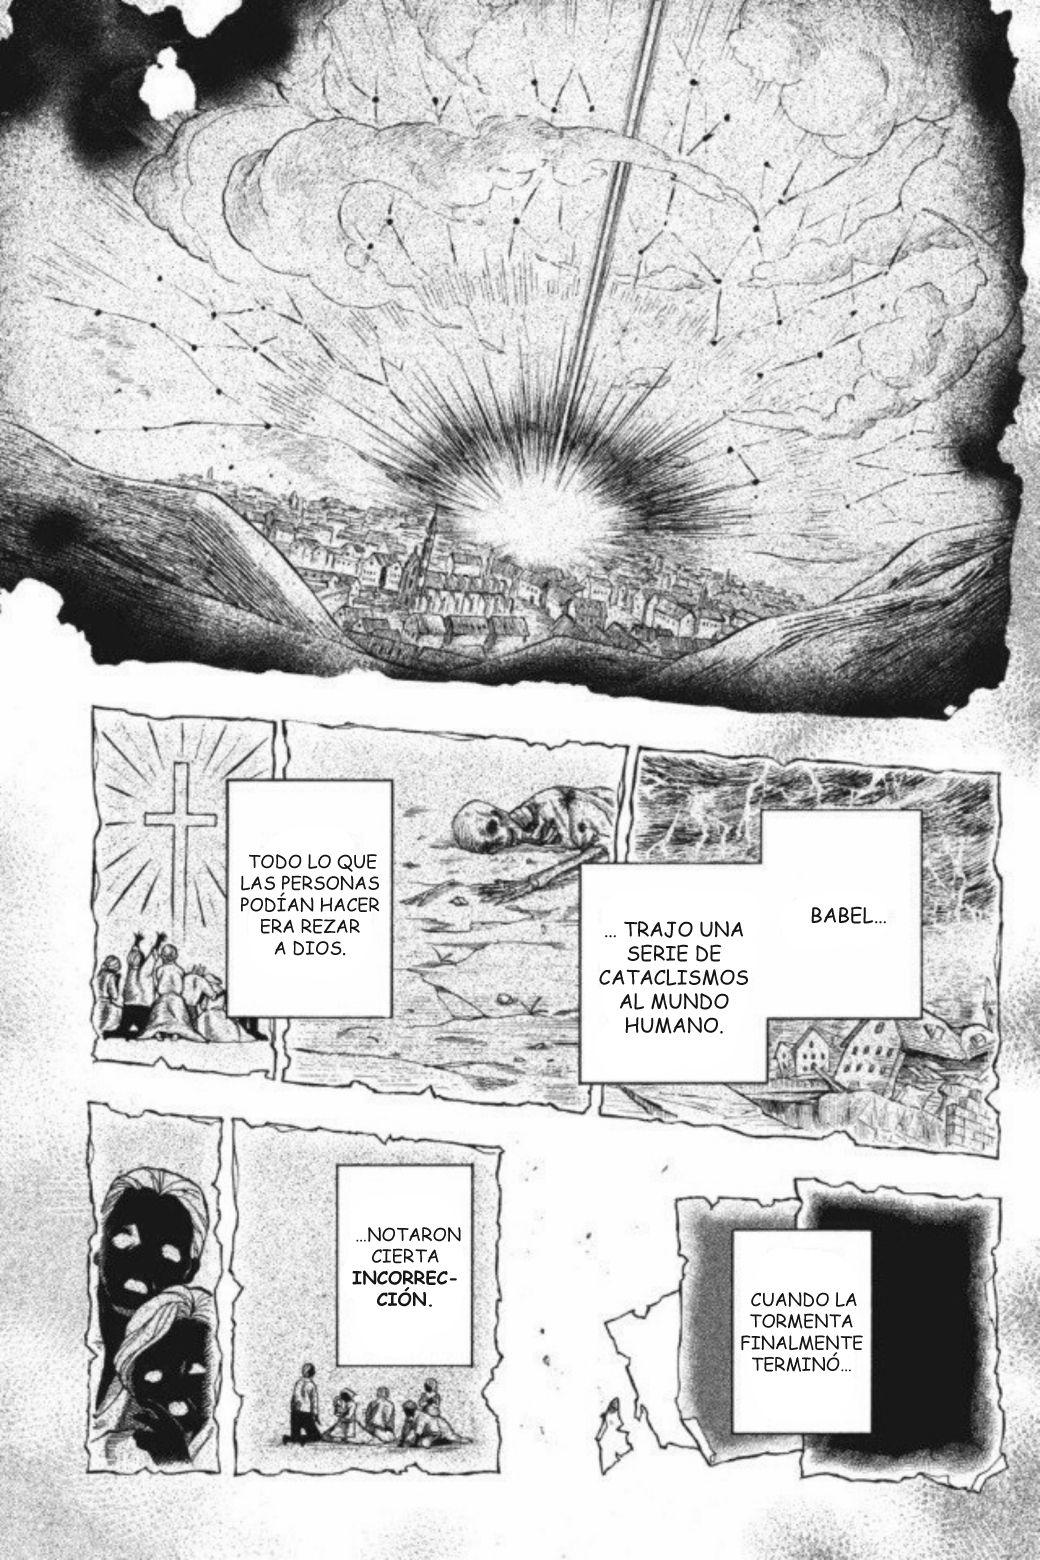 https://c5.ninemanga.com/es_manga/48/18672/478200/0a2f8c50529b612e87c8f99a089bdddd.jpg Page 4